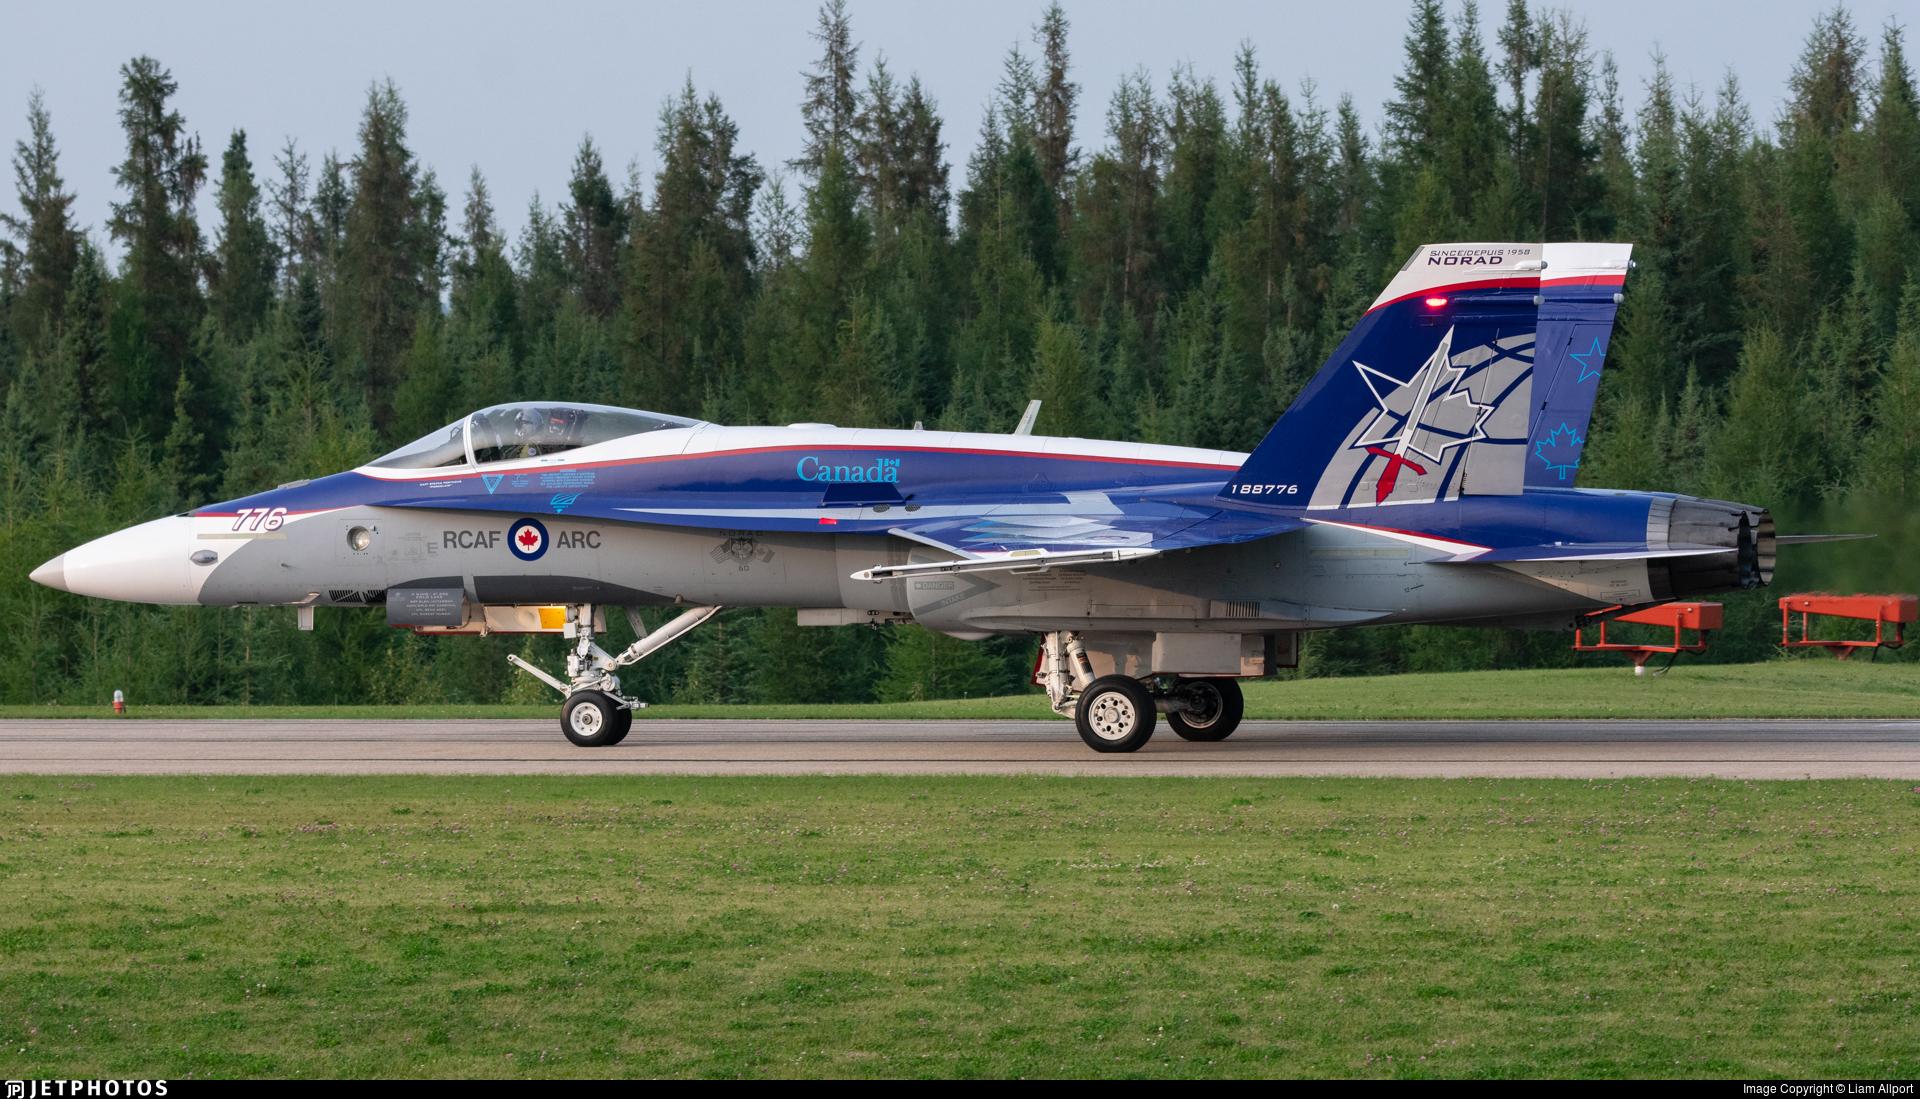 188776 - McDonnell Douglas CF-188 Hornet - Canada - Royal Canadian Air Force (RCAF)